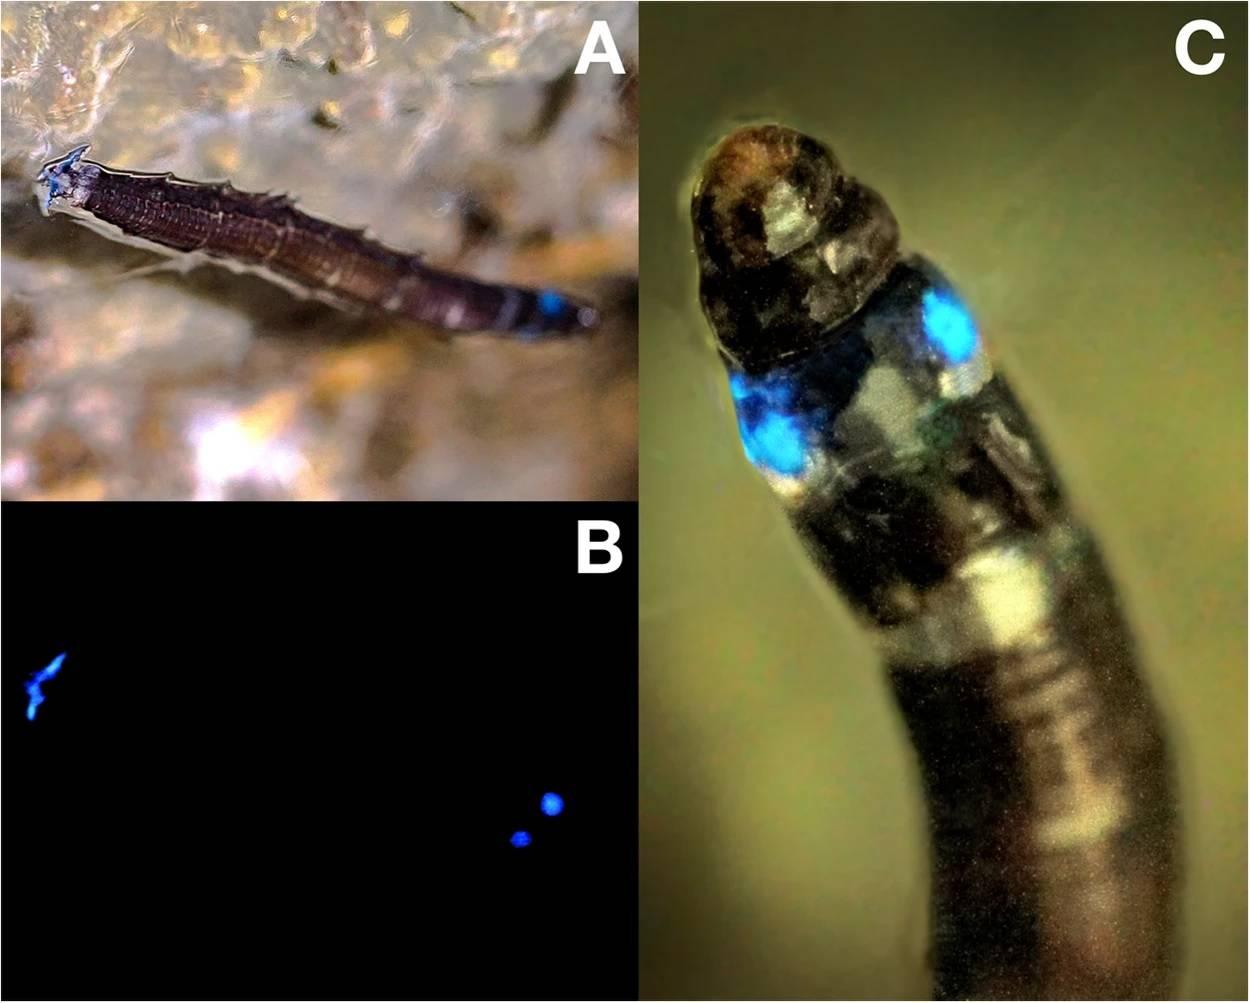 Descubren por primera vez un insecto que emite luz azul por primera vez en Brasil